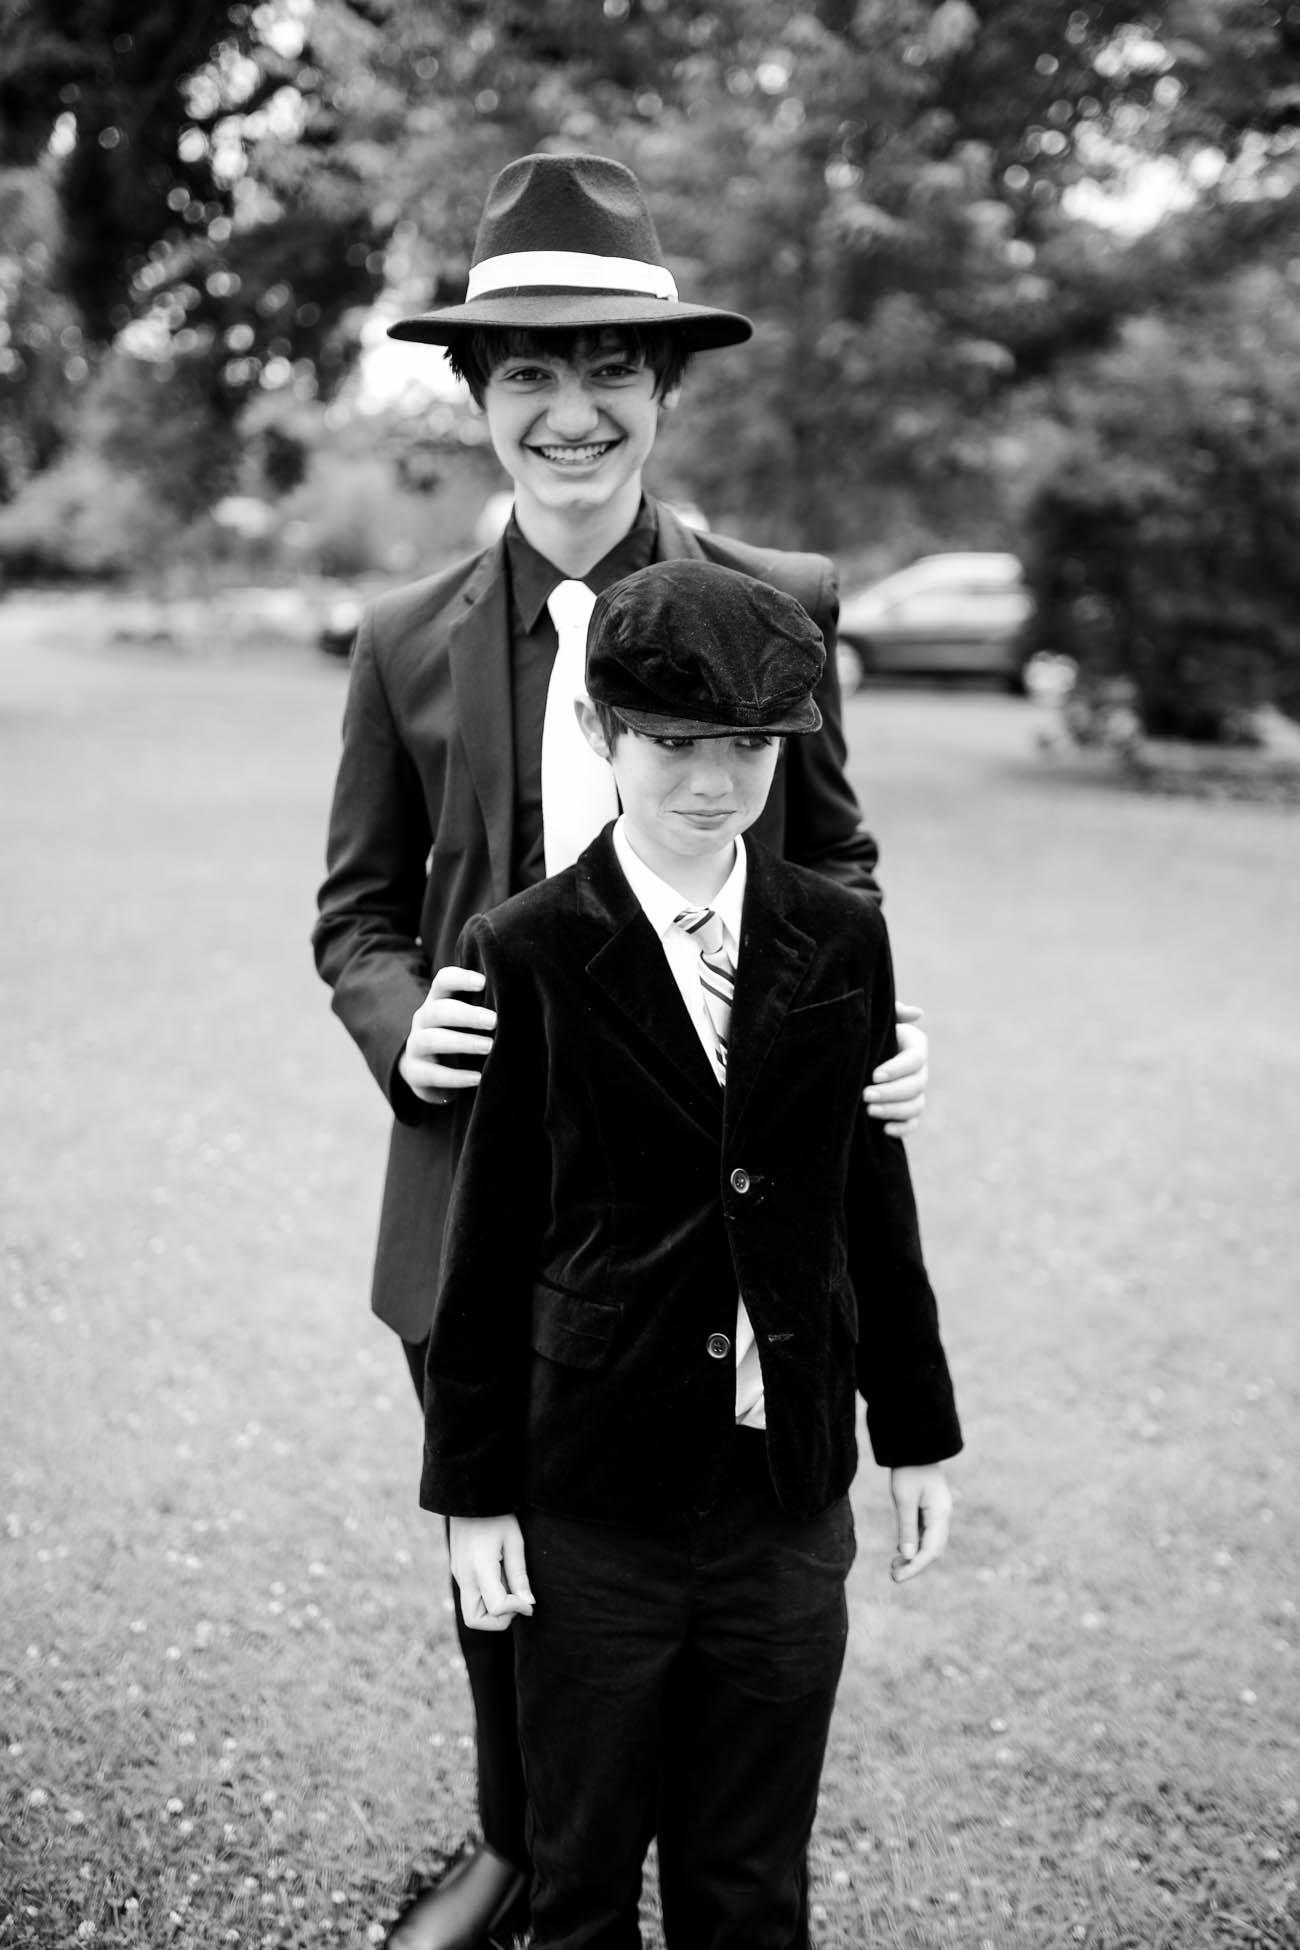 Speakeasy-1920s-theme-Louisville-and-Lexington Wedding-263.jpg